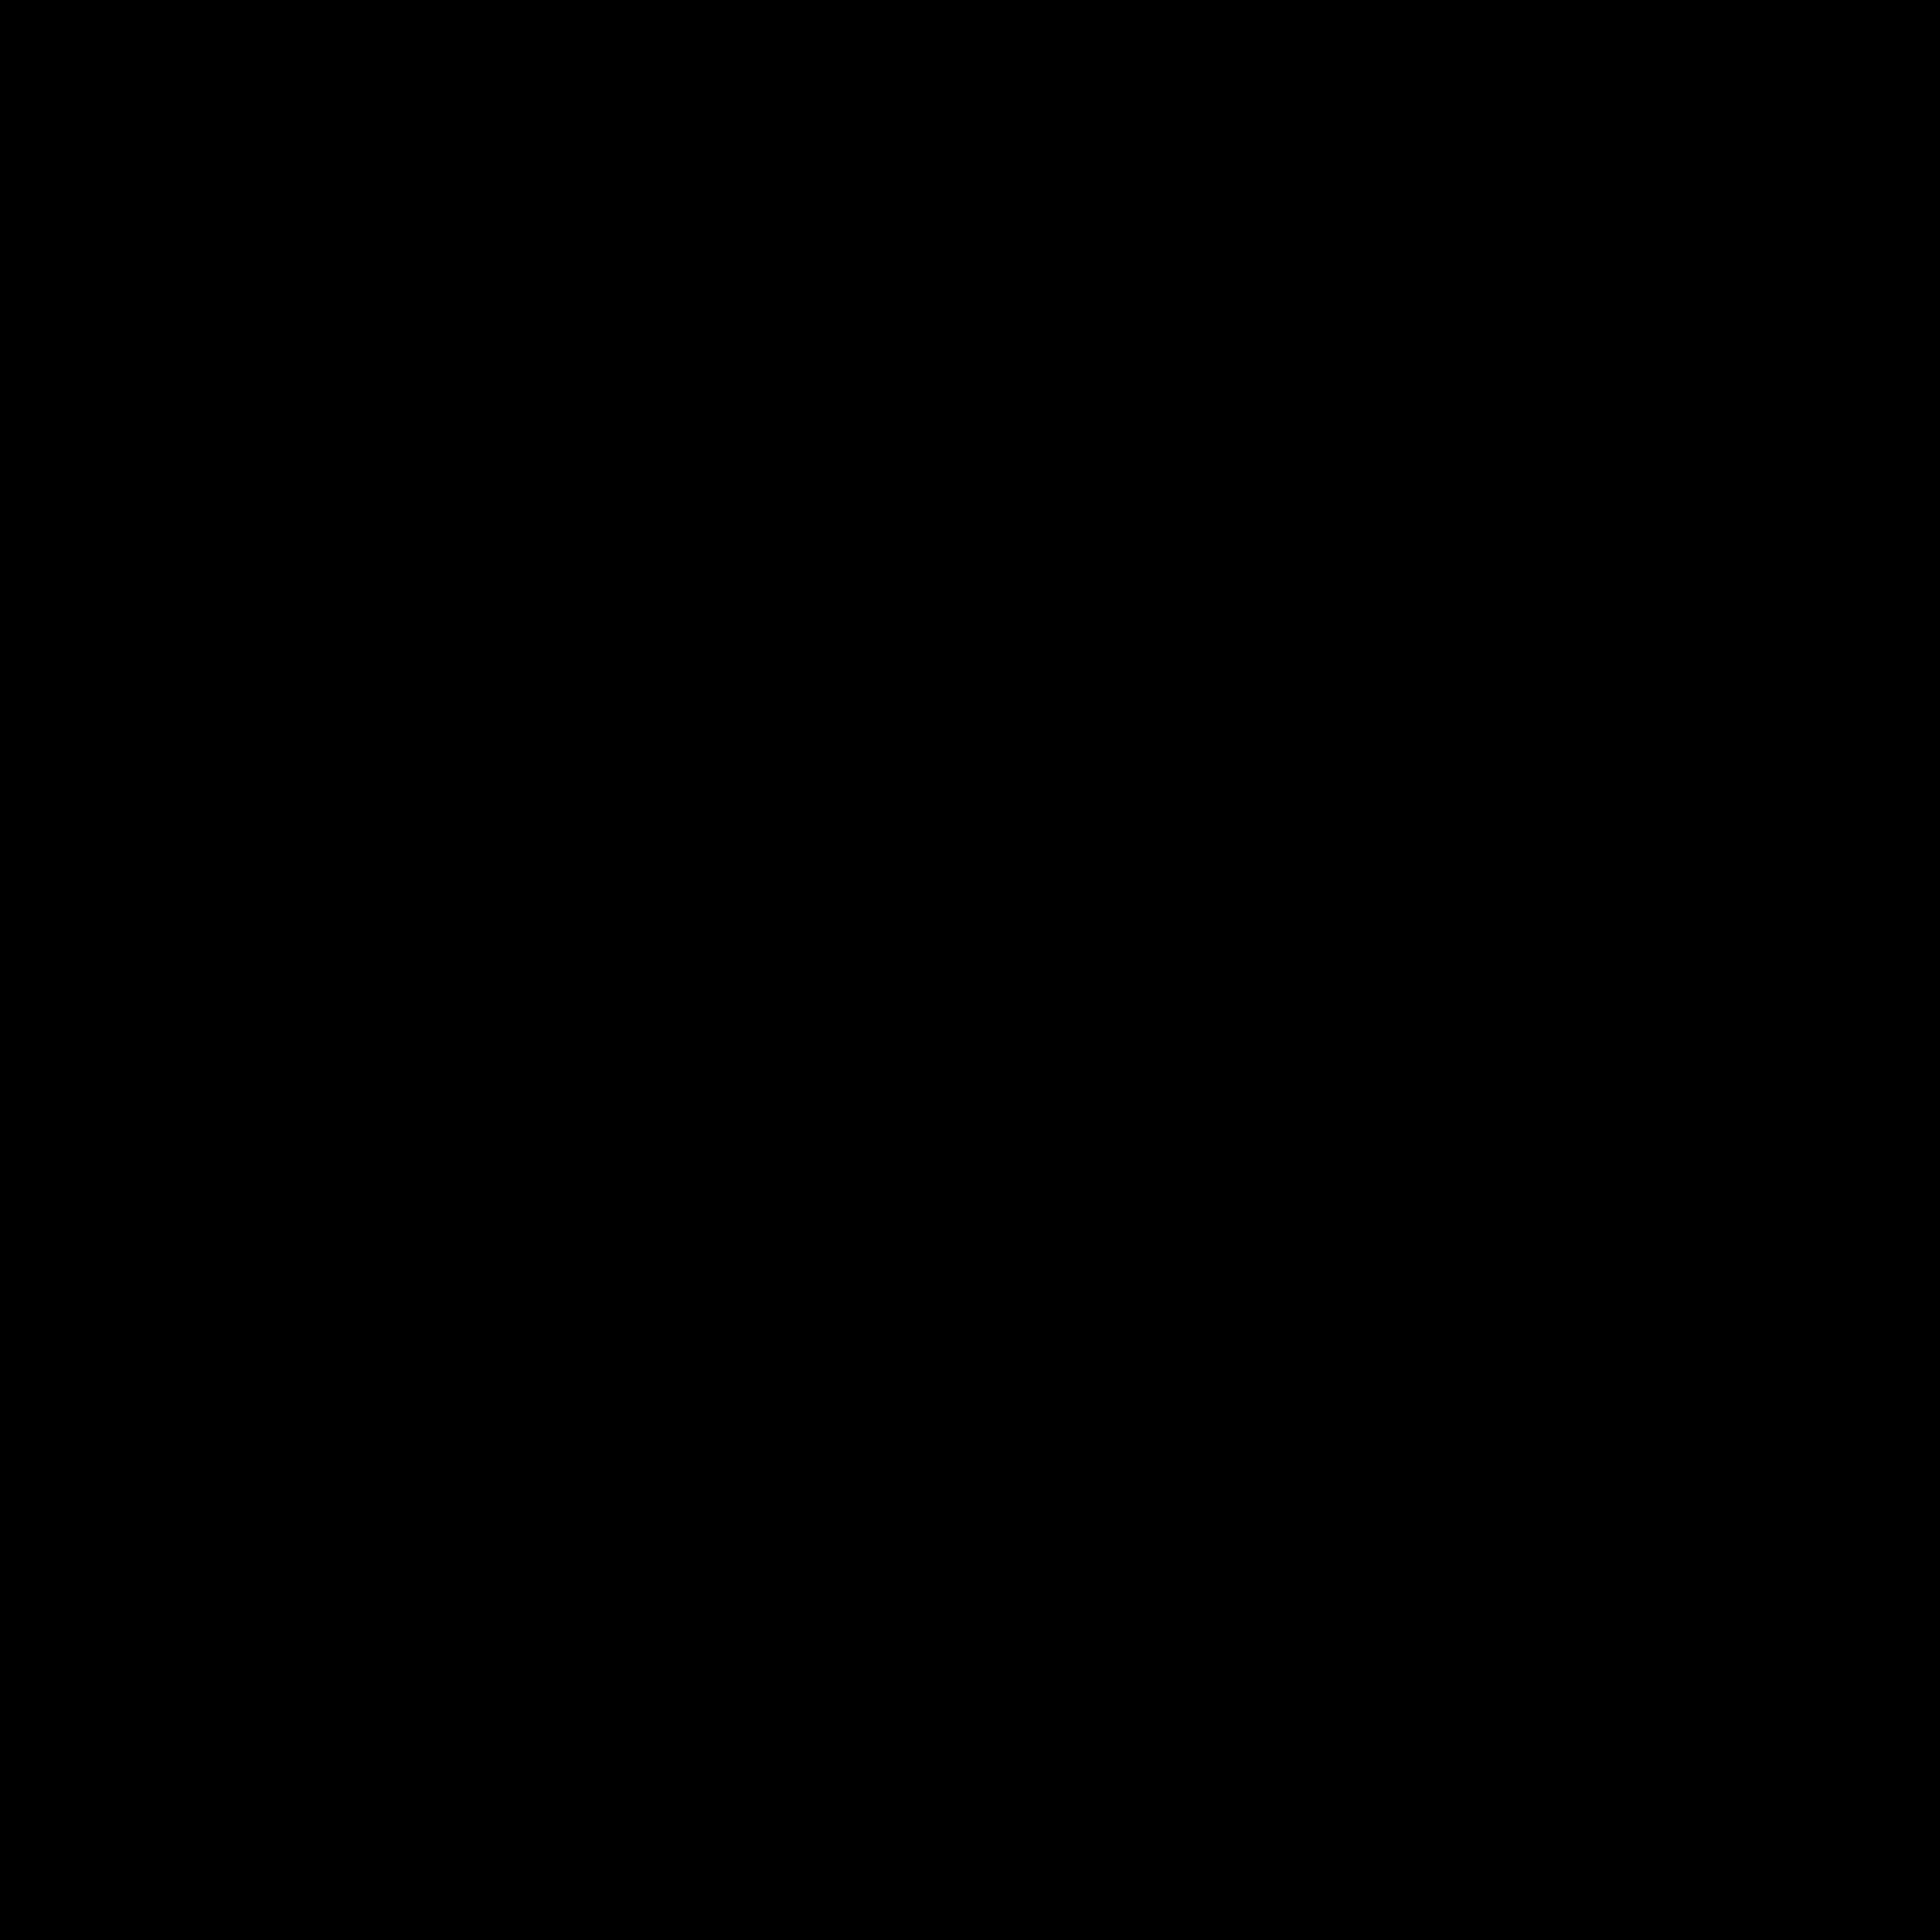 Sea World Logo Transparent Amp Svg Vector Freebie Supply